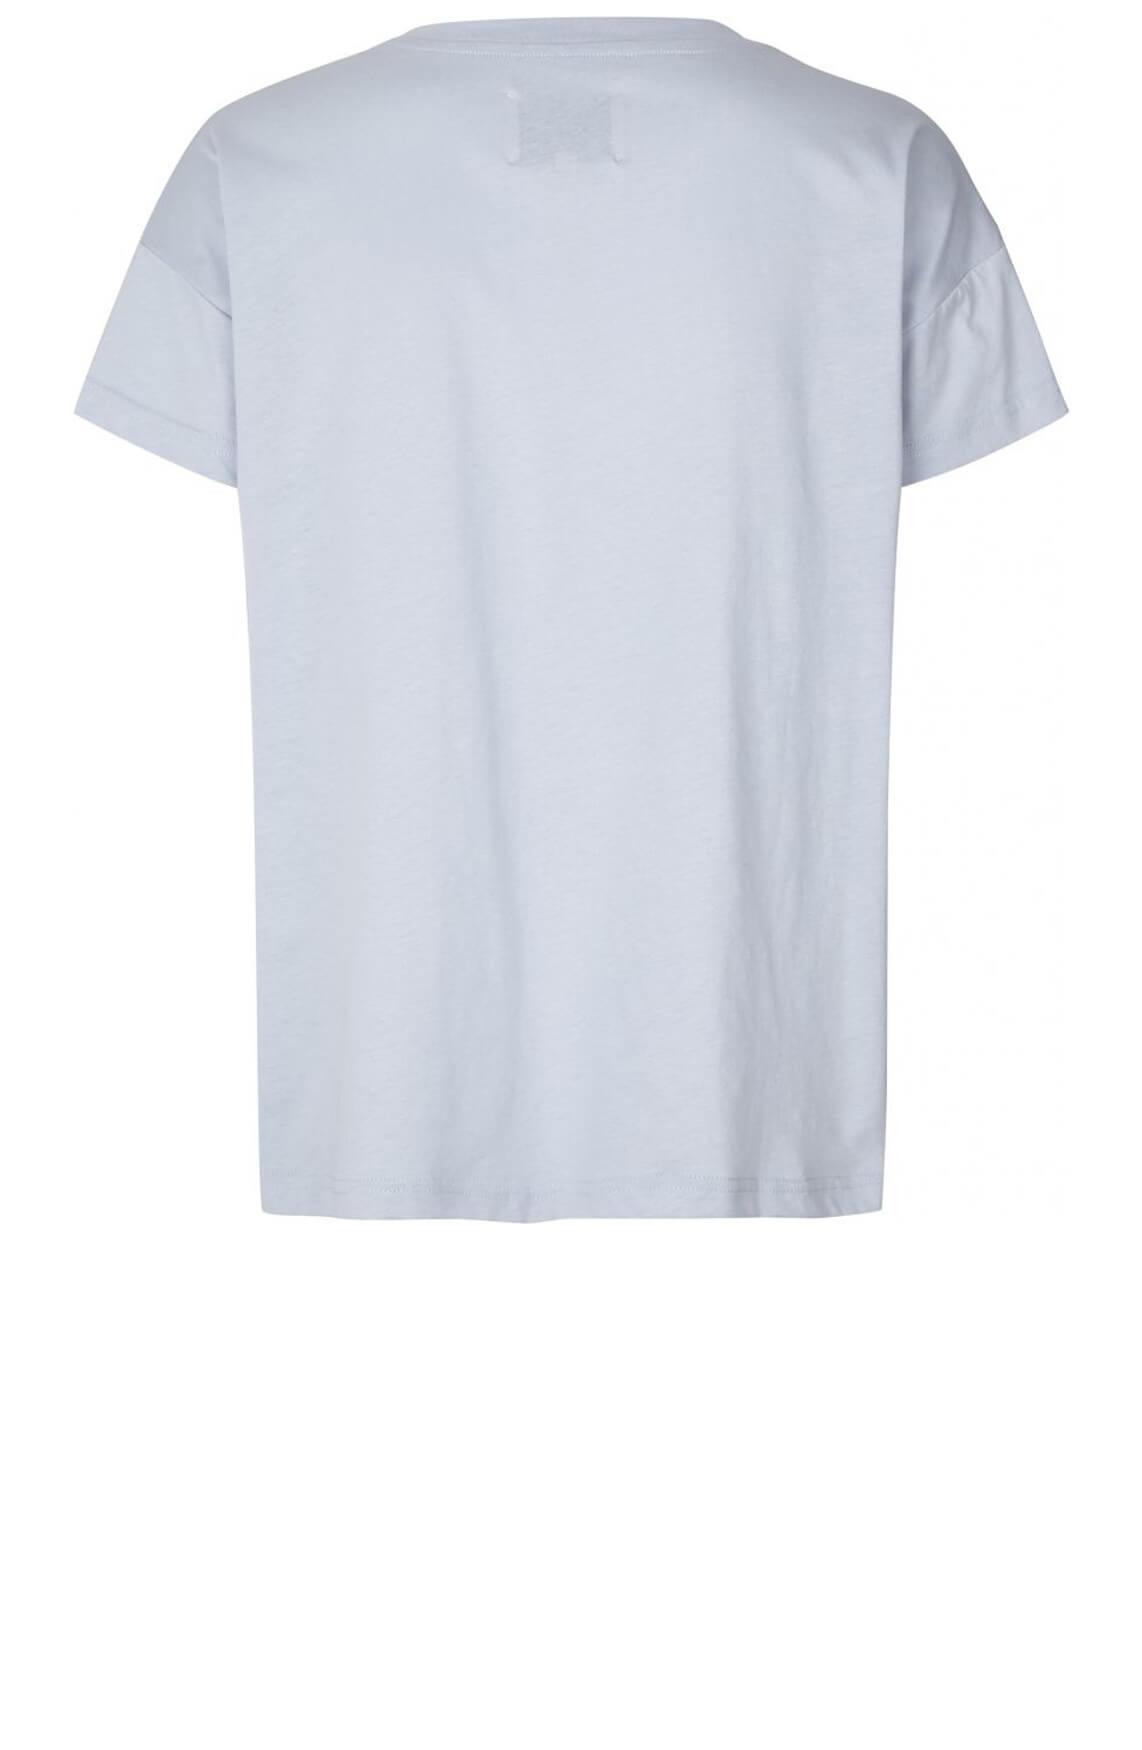 Lollys Laundry Dames Donna shirt Blauw